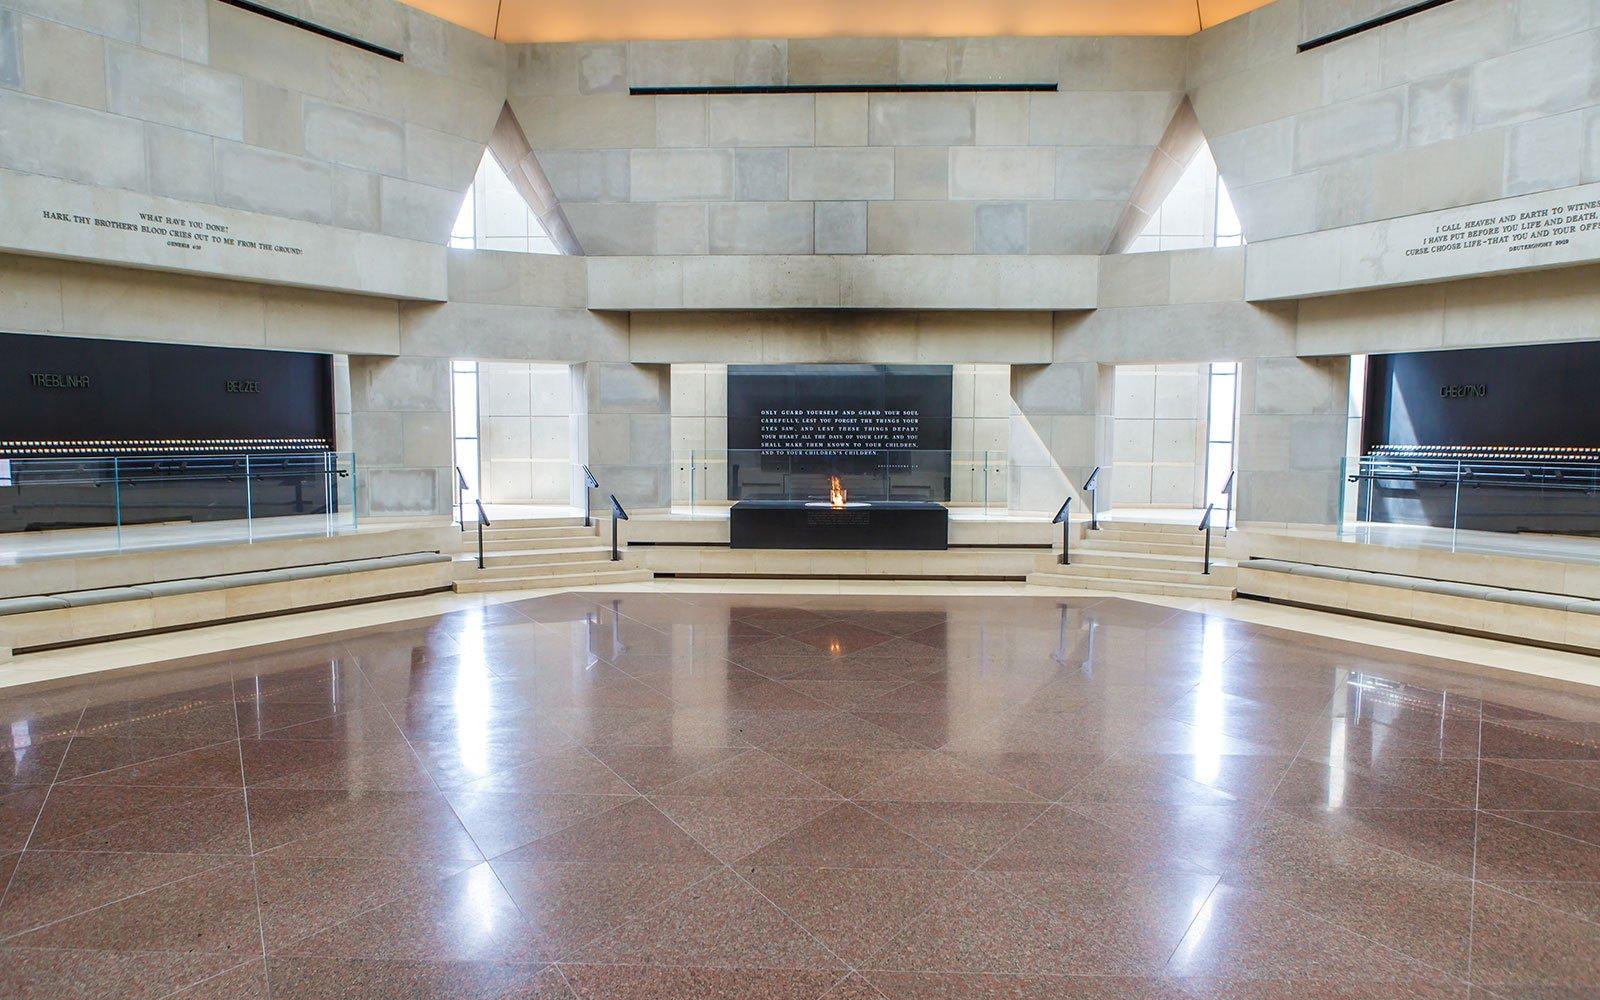 Washington United States Holocaust Memorial Museum